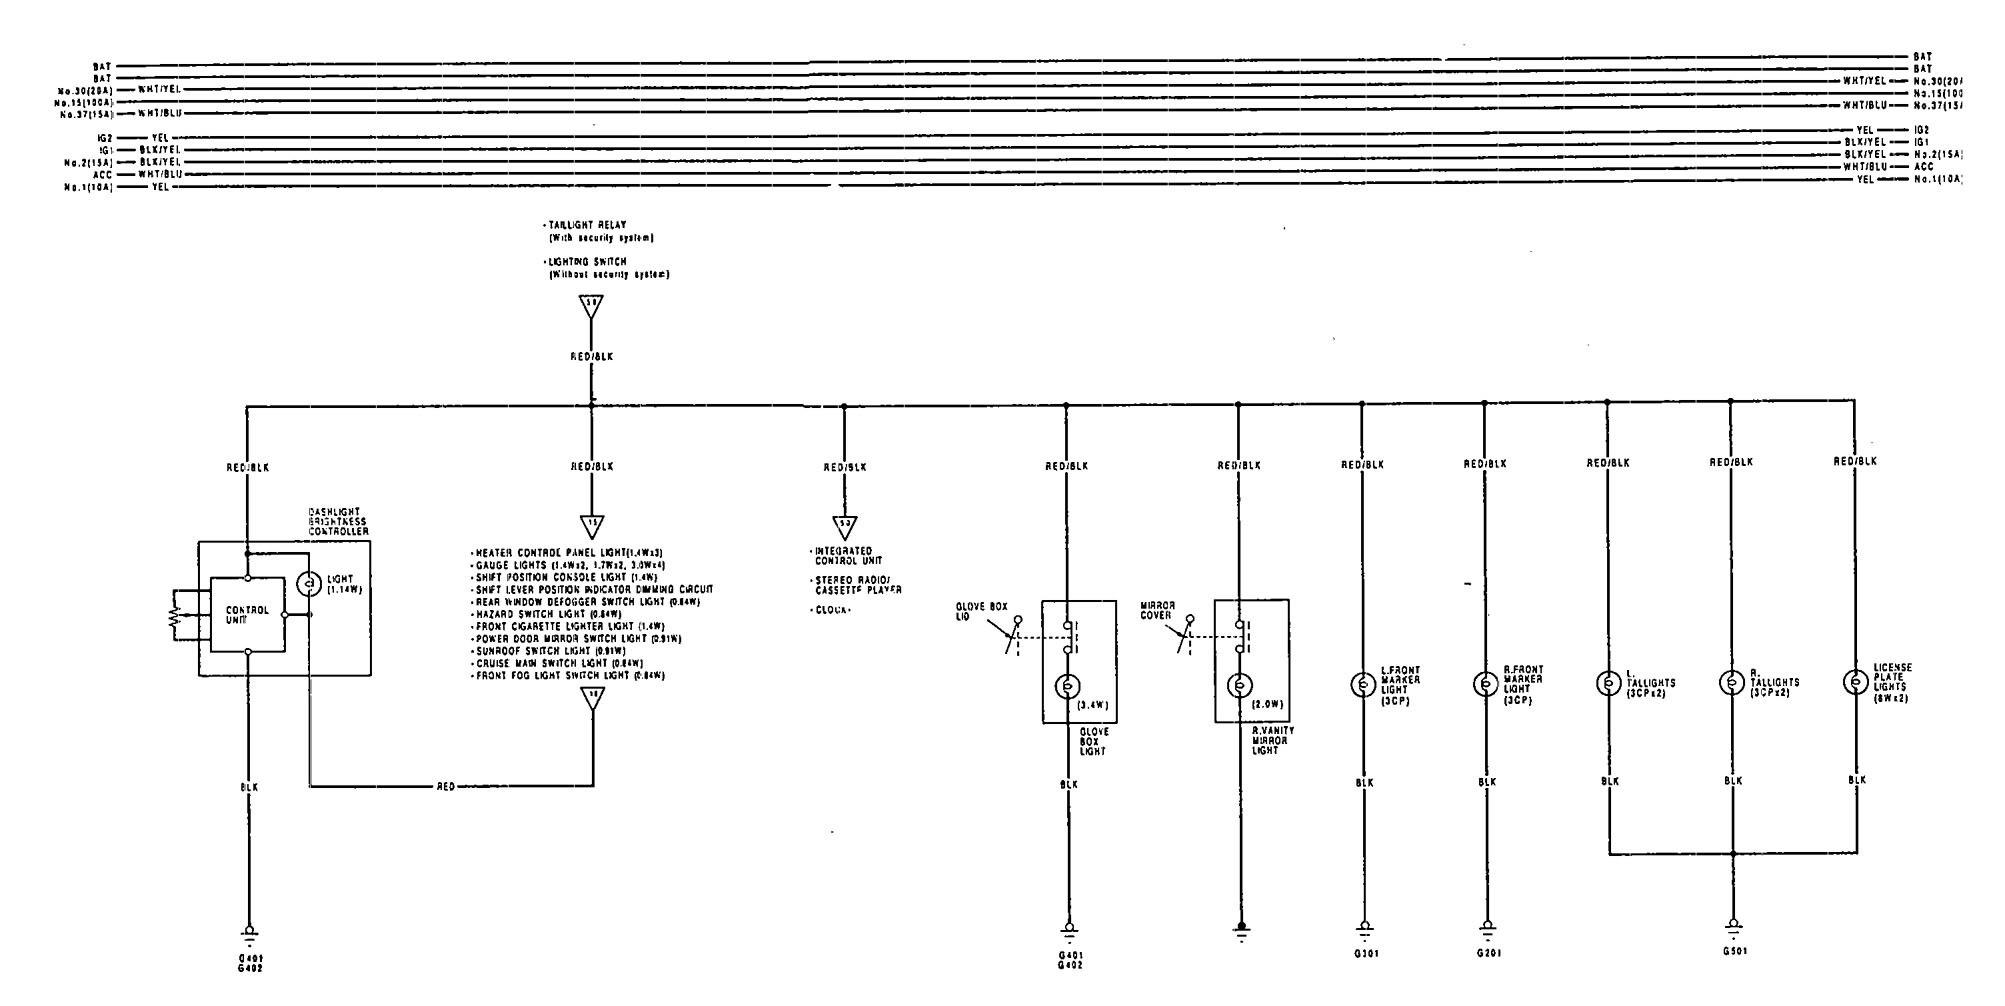 Acura Vigor (1992) - wiring diagrams - license plate lamp ...